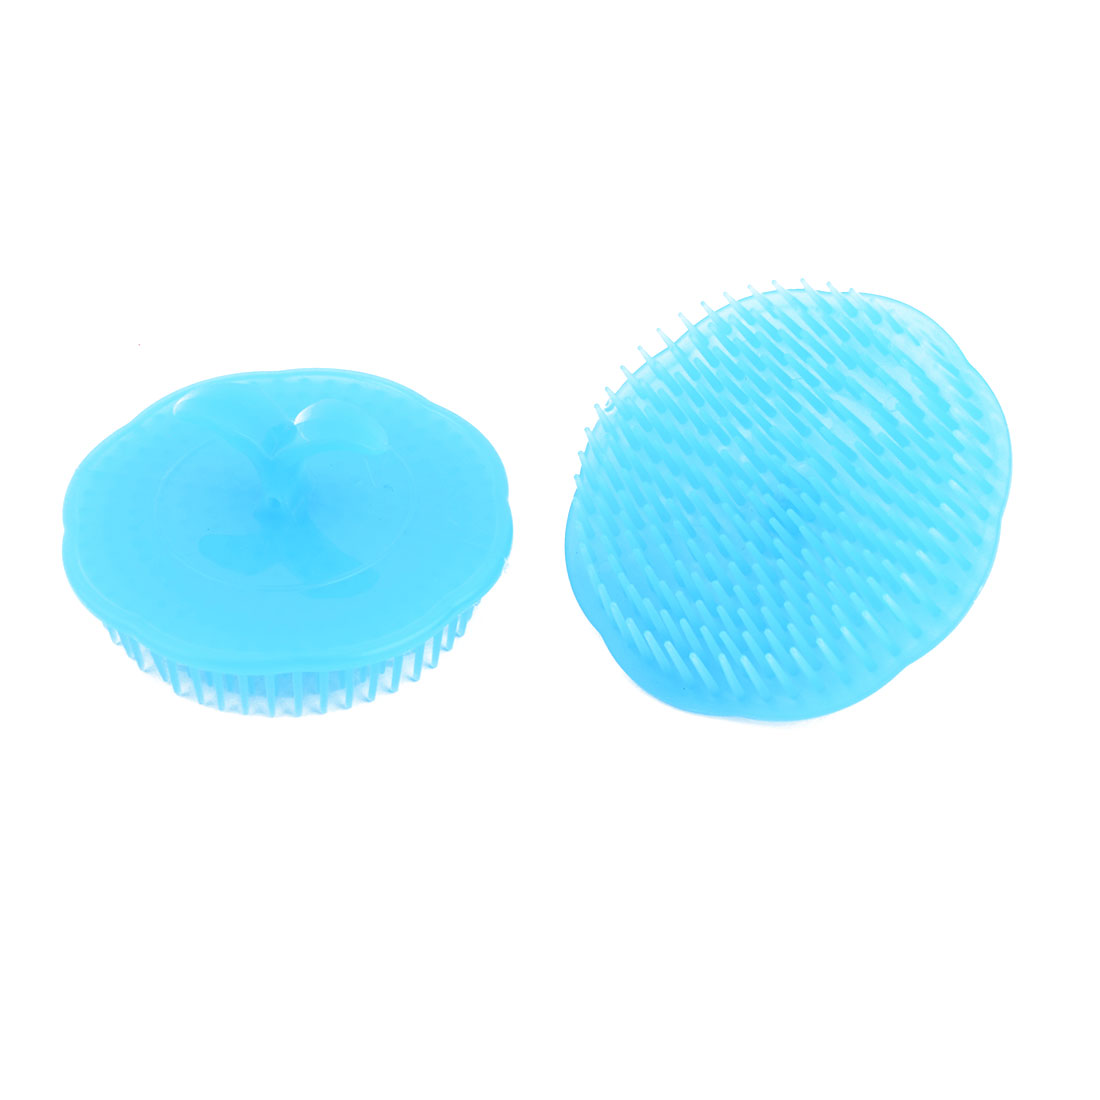 Household Plastic Handheld Head Hair Massaging Tool Shampoo Brush Blue 2pcs